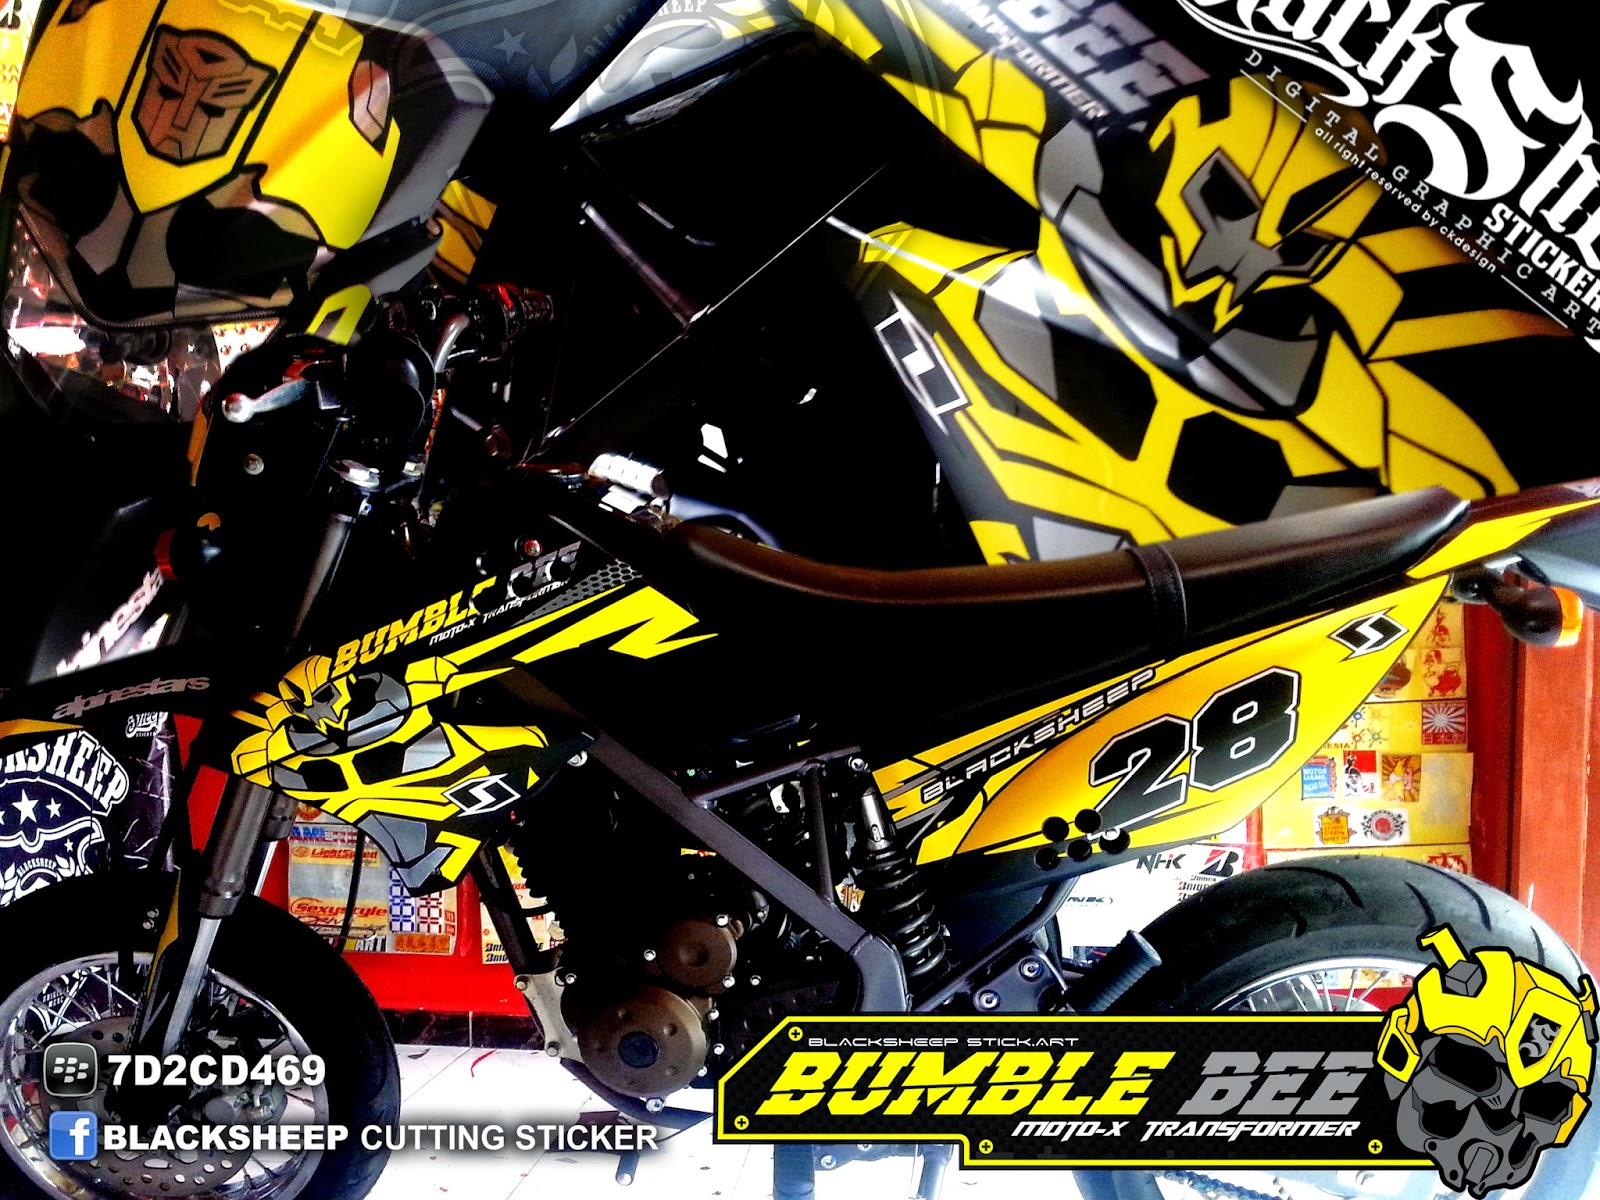 3d Yamaha Motorcycle Wallpaper Kawasaki D Tracker Bumble Bee Cutting Sticker Blacksheep